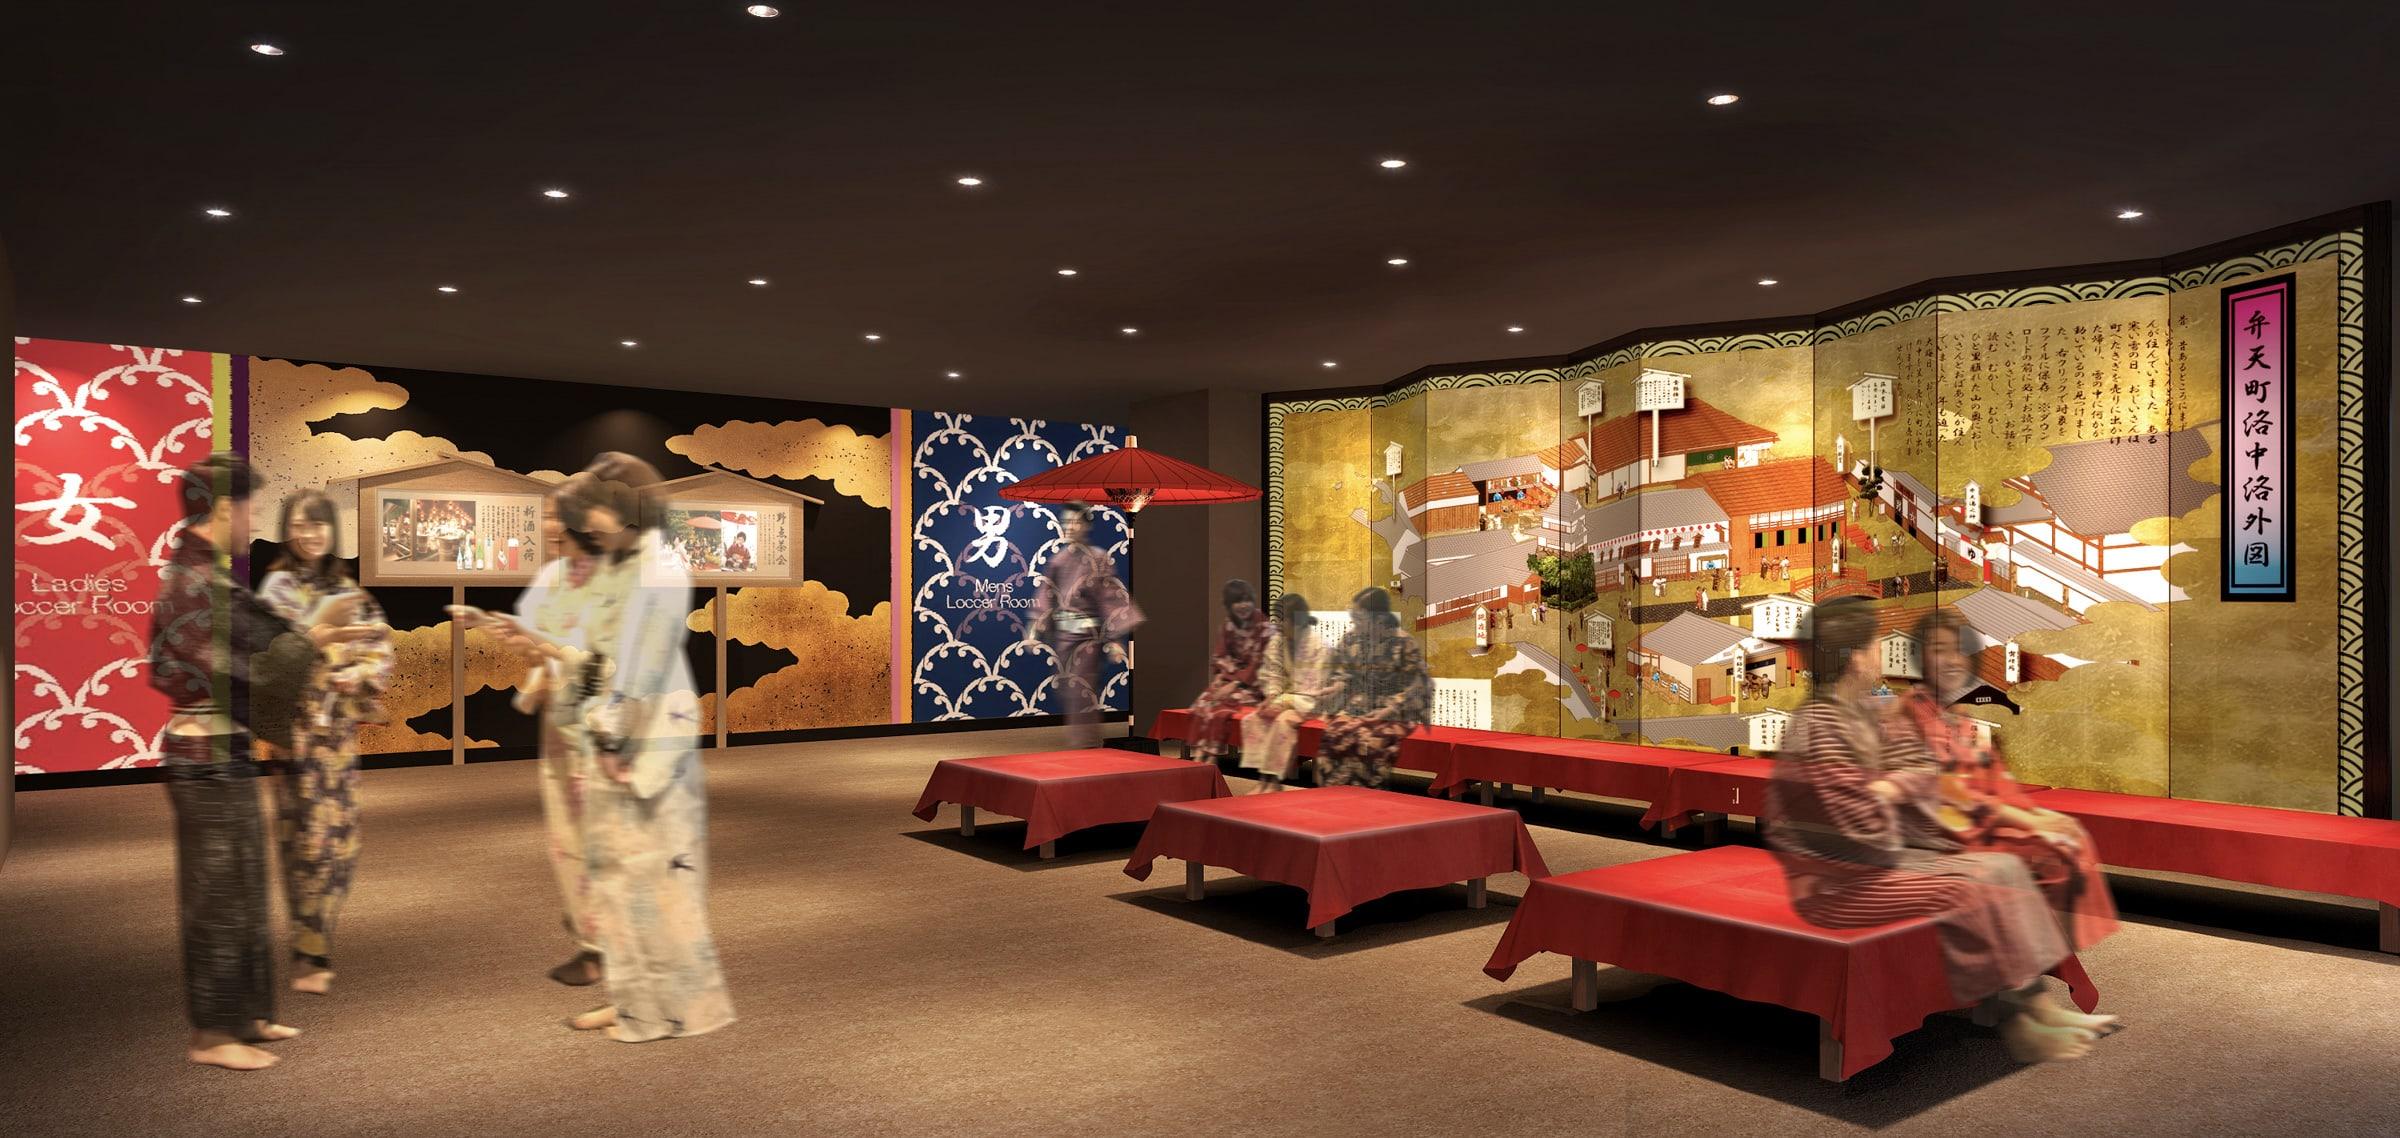 e71f182dec2d3 関西最大規模の温泉型テーマパークが大阪に誕生、安土桃山時代をイメージ ...